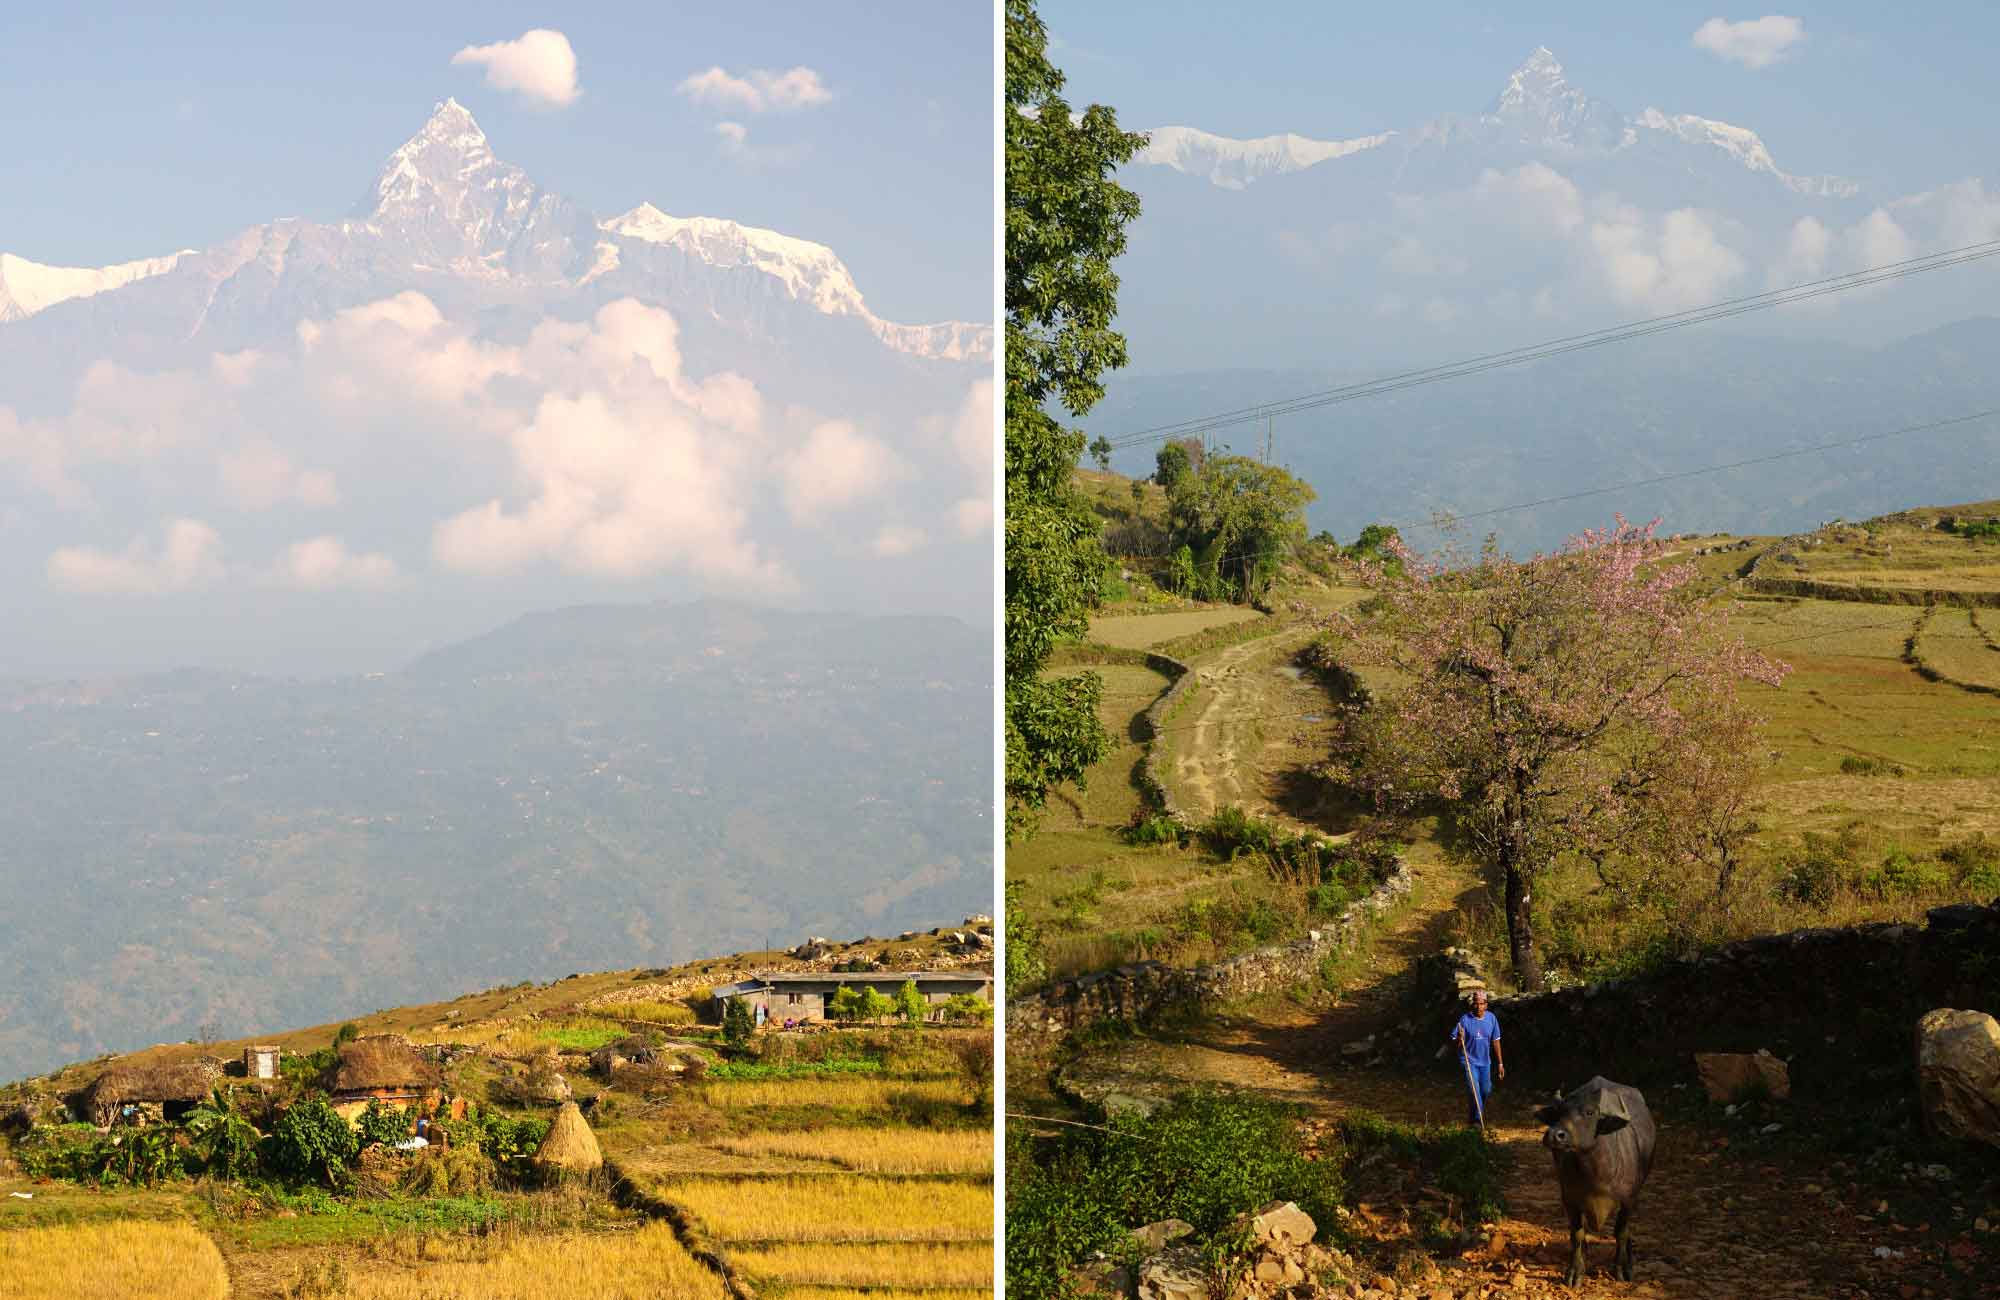 Pokhara au Népal - Amplitudes voyage